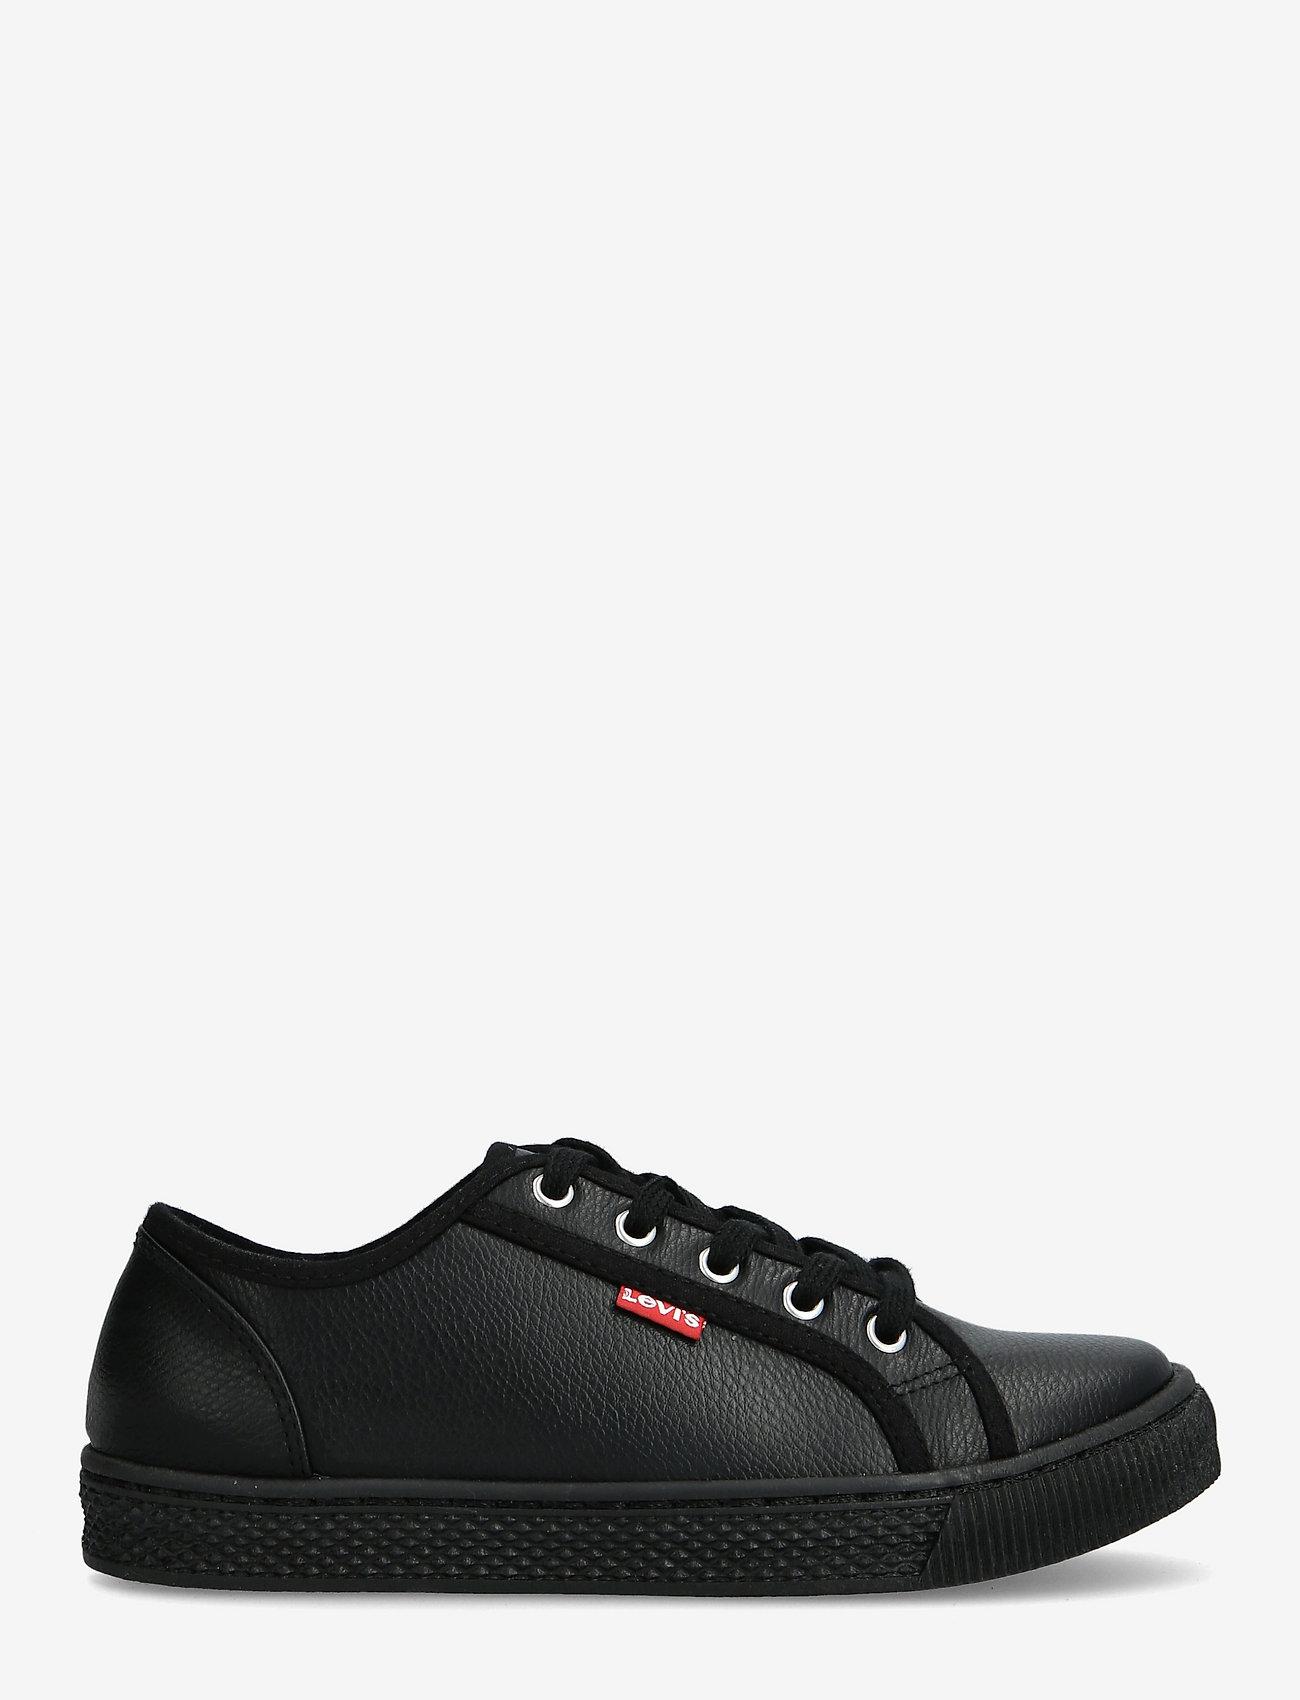 Levi's Shoes - MALIBU BEACH S - lave sneakers - regular black - 1